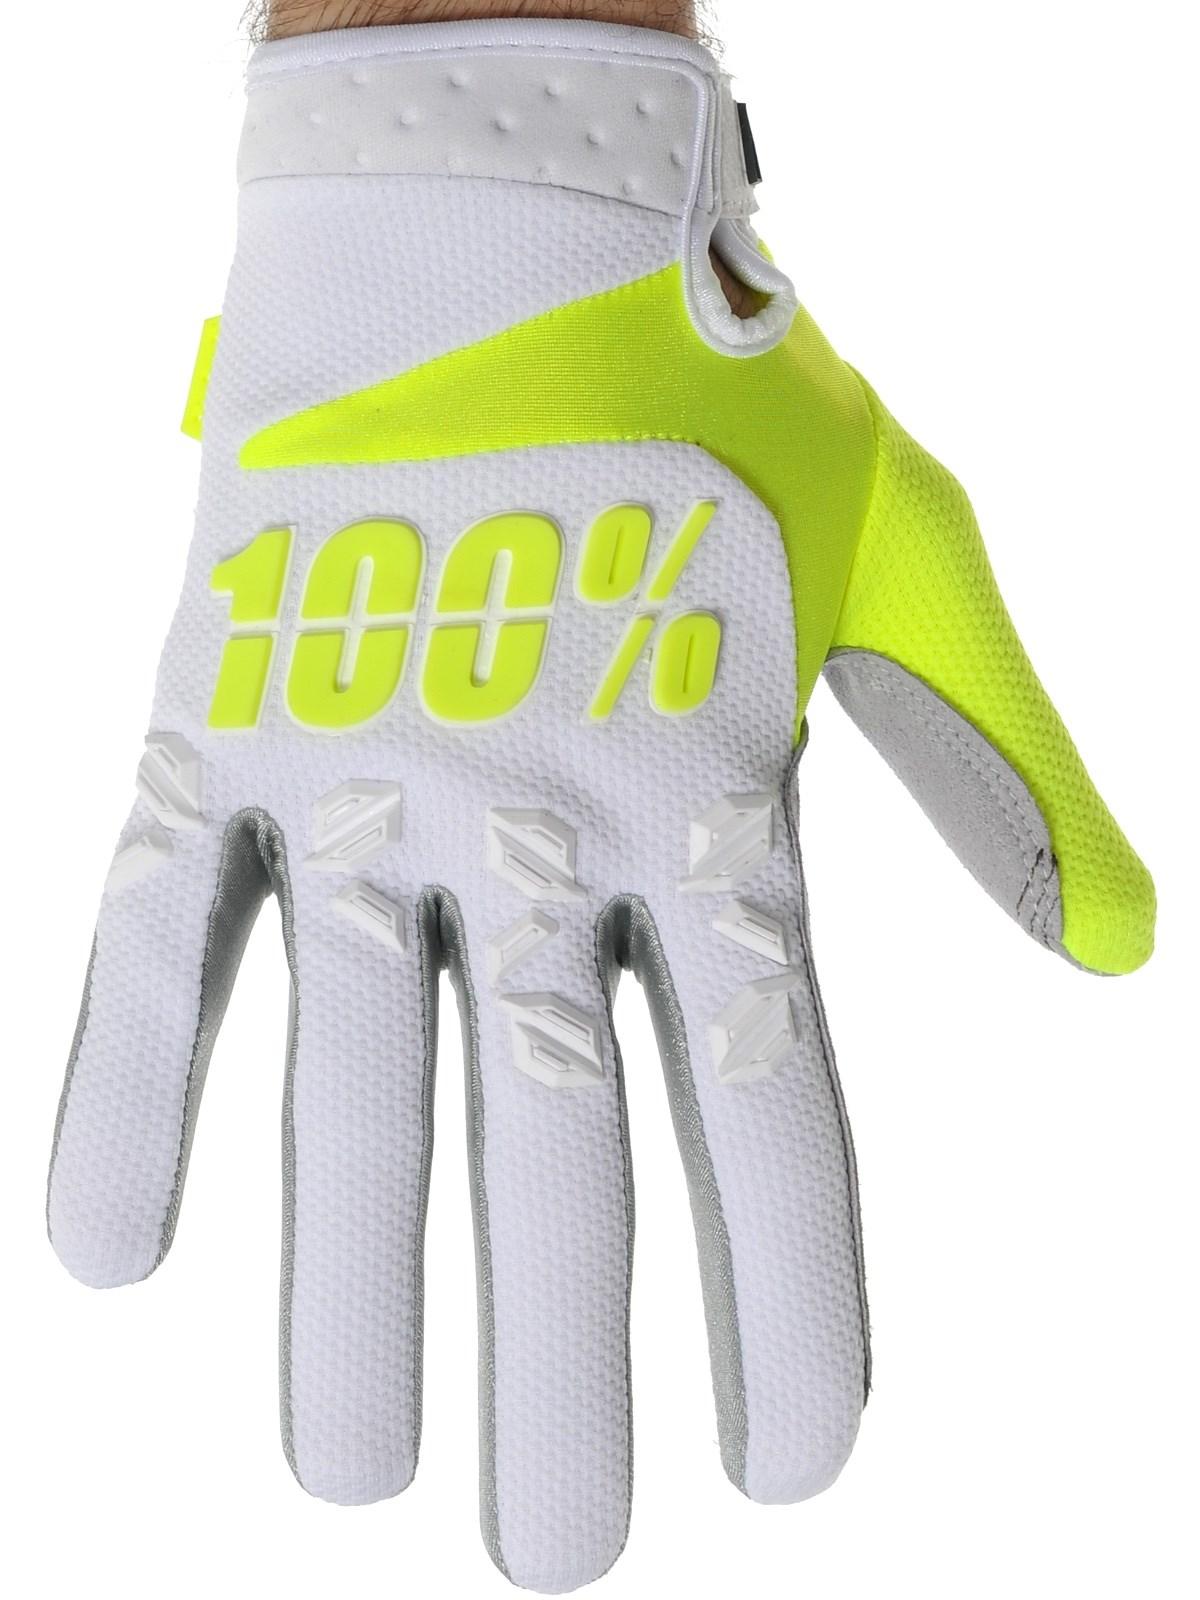 MANUSI MX 100% AIRMATIC ALB/GALBEN/GRI #XL